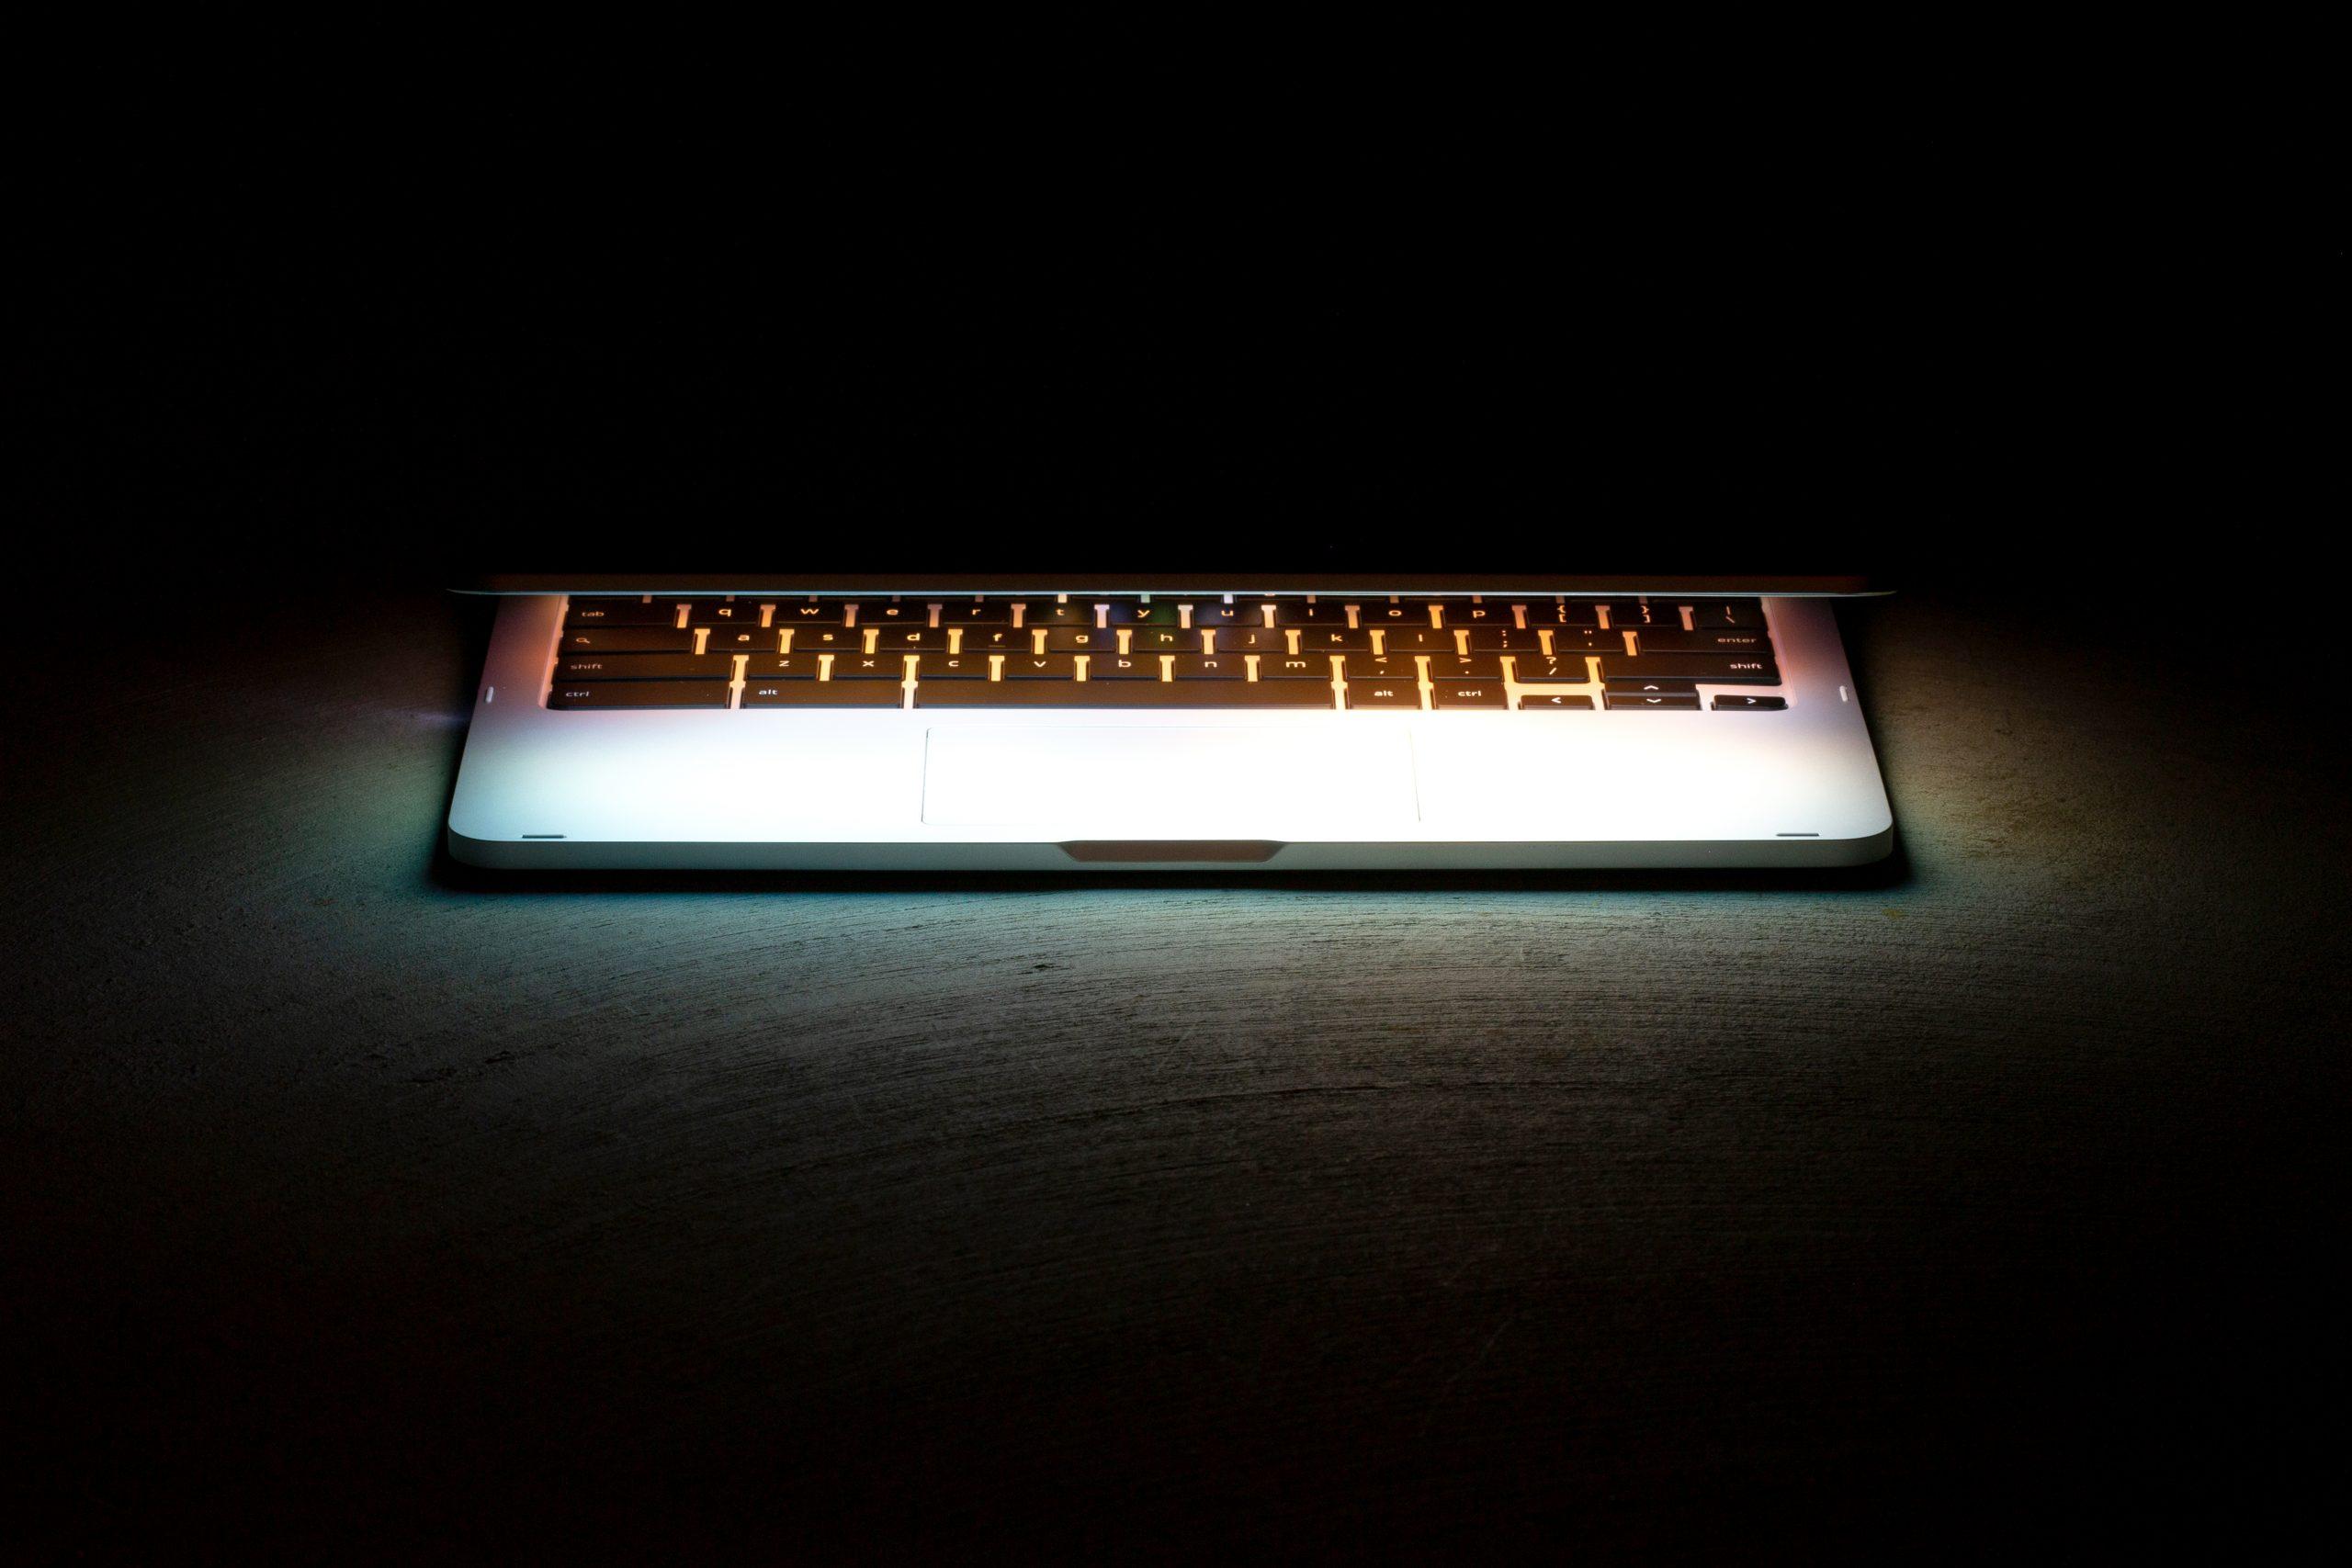 ciberseguranca pc laptop computador